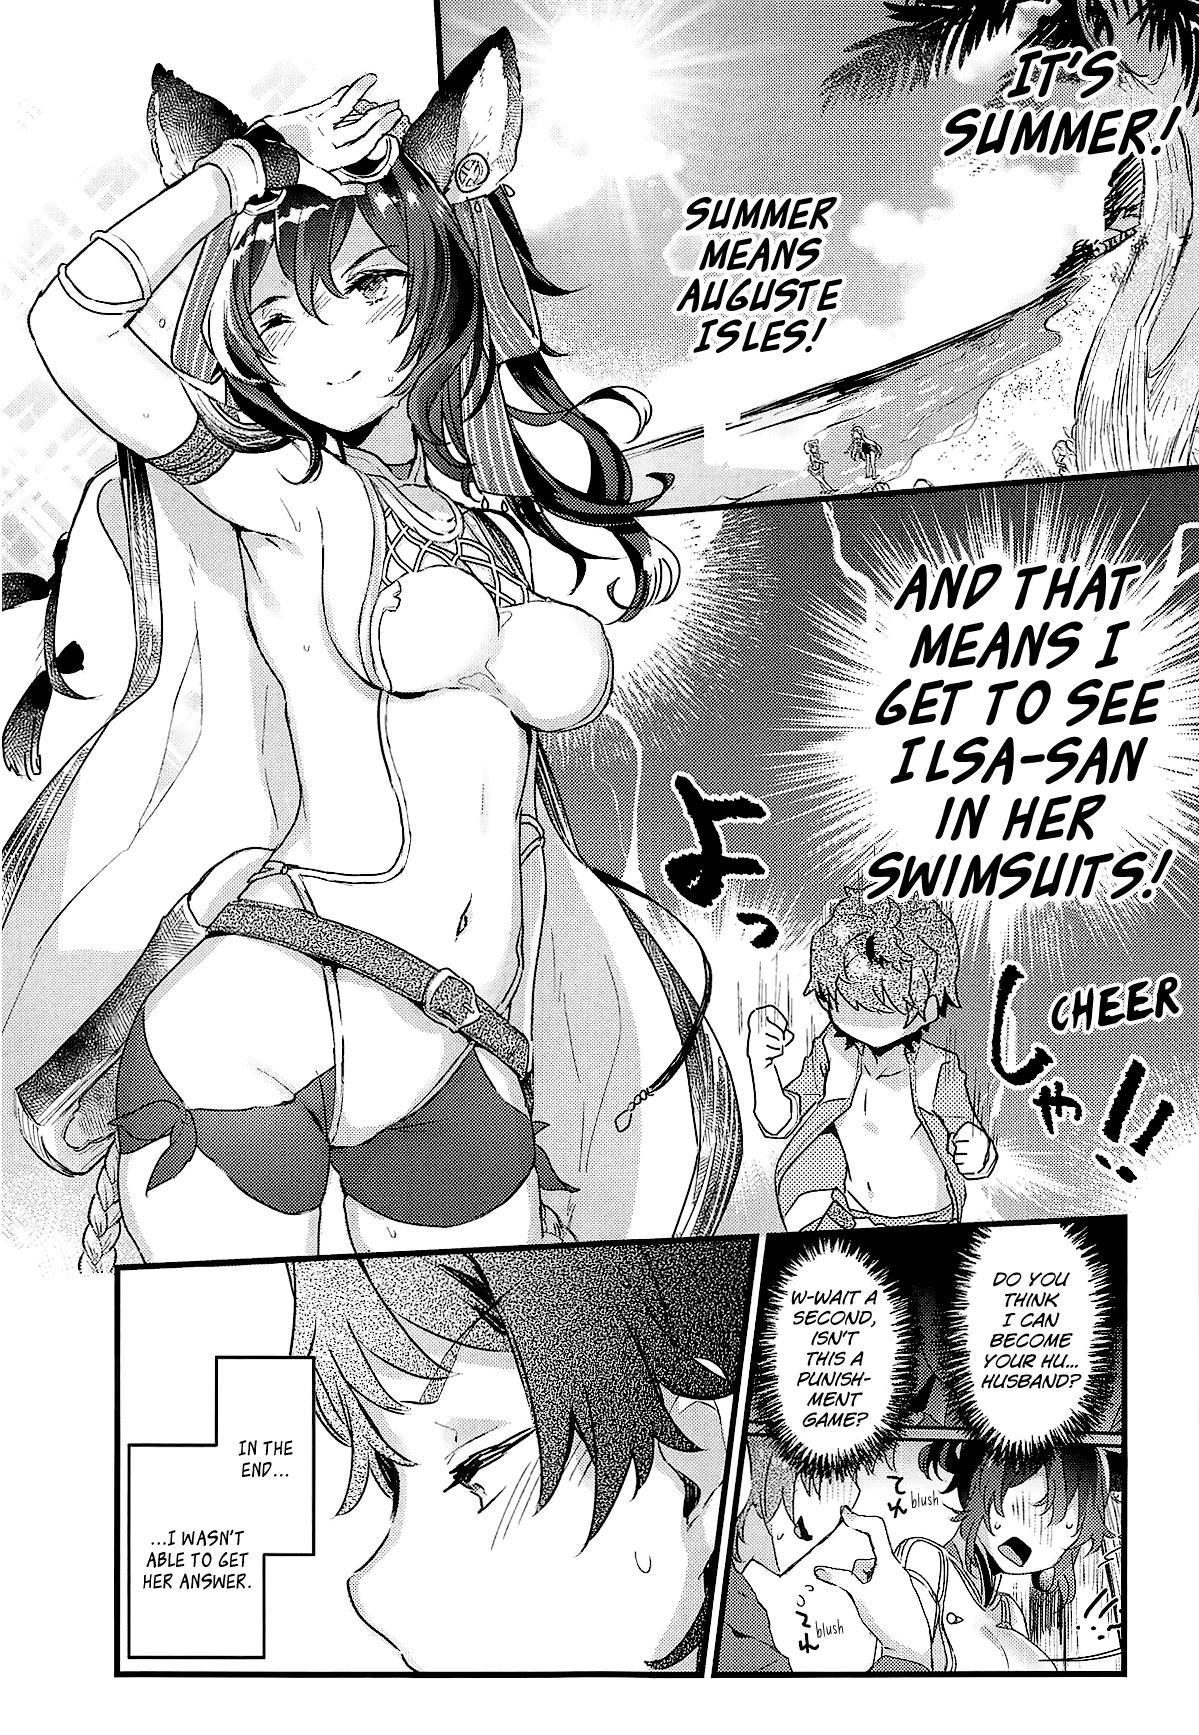 (COMIC1☆15) [Tenkirin (Kanroame)] Ilsa-san to Guste de Vacances | A Vacation to Auguste Isles With Ilsa-san (Granblue Fantasy) [English] [Aoitenshi] 4